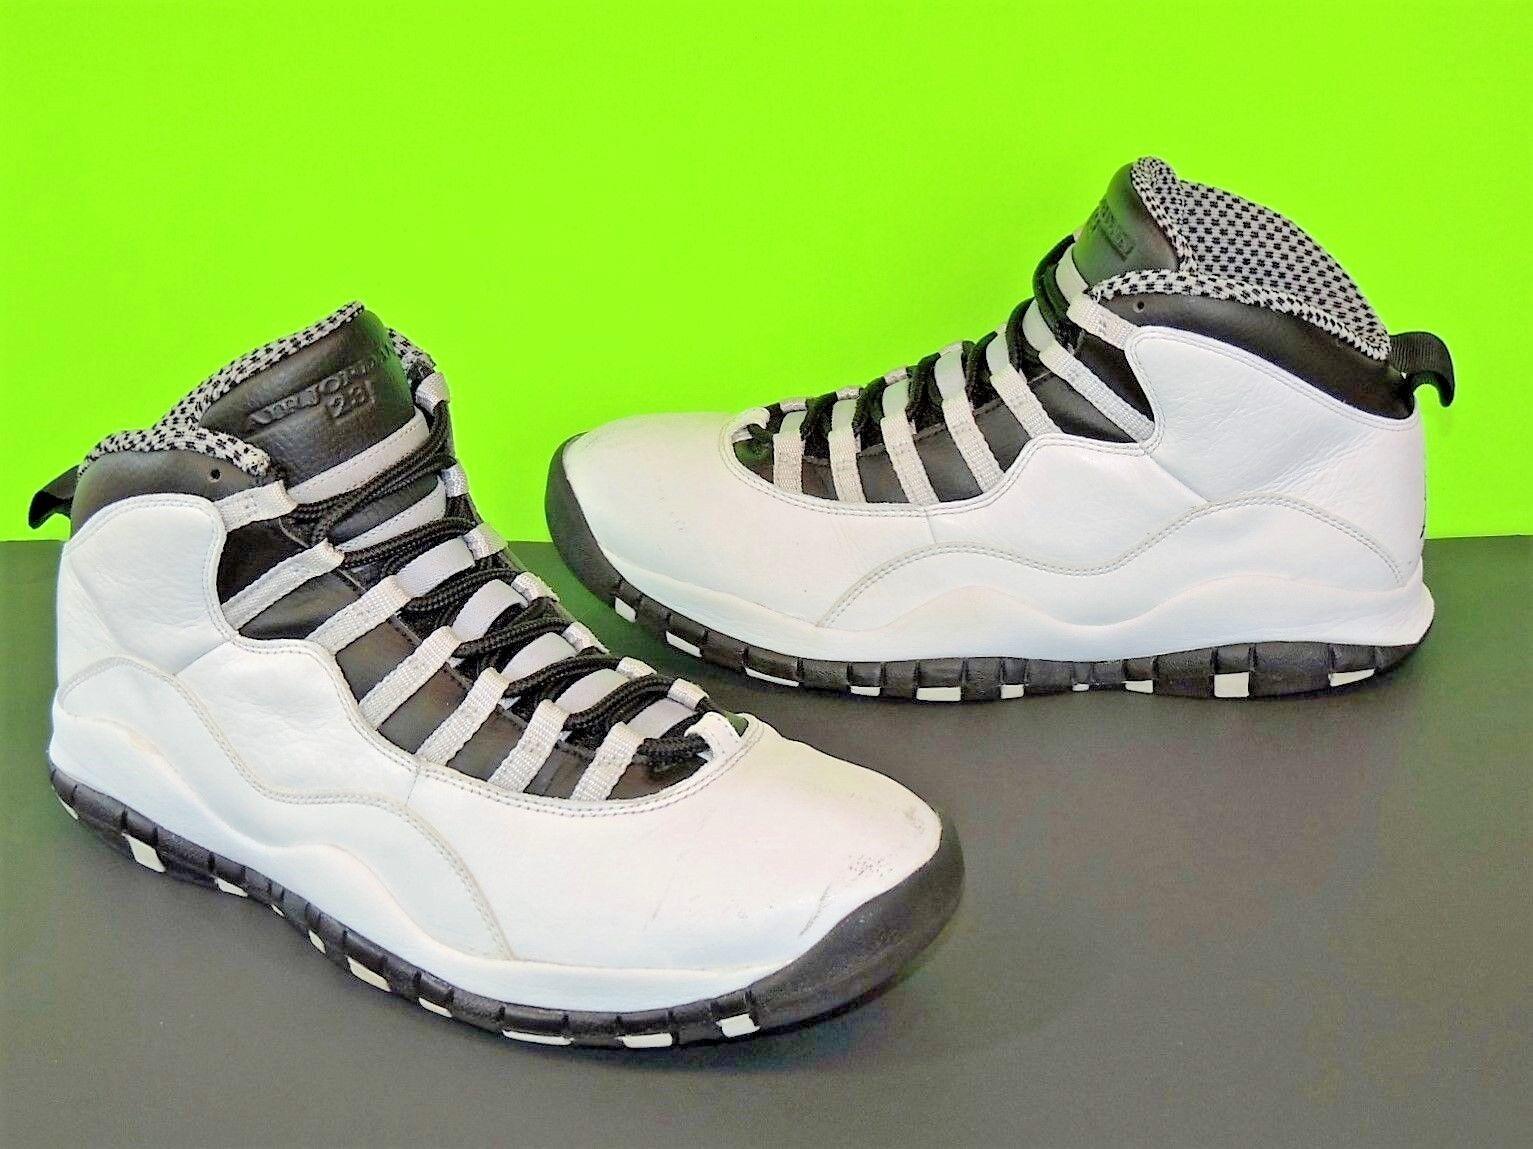 Nike Air Jordan Steel X 10 10.5 Sneaker Shoe Retro Stealth Grey DS Black White